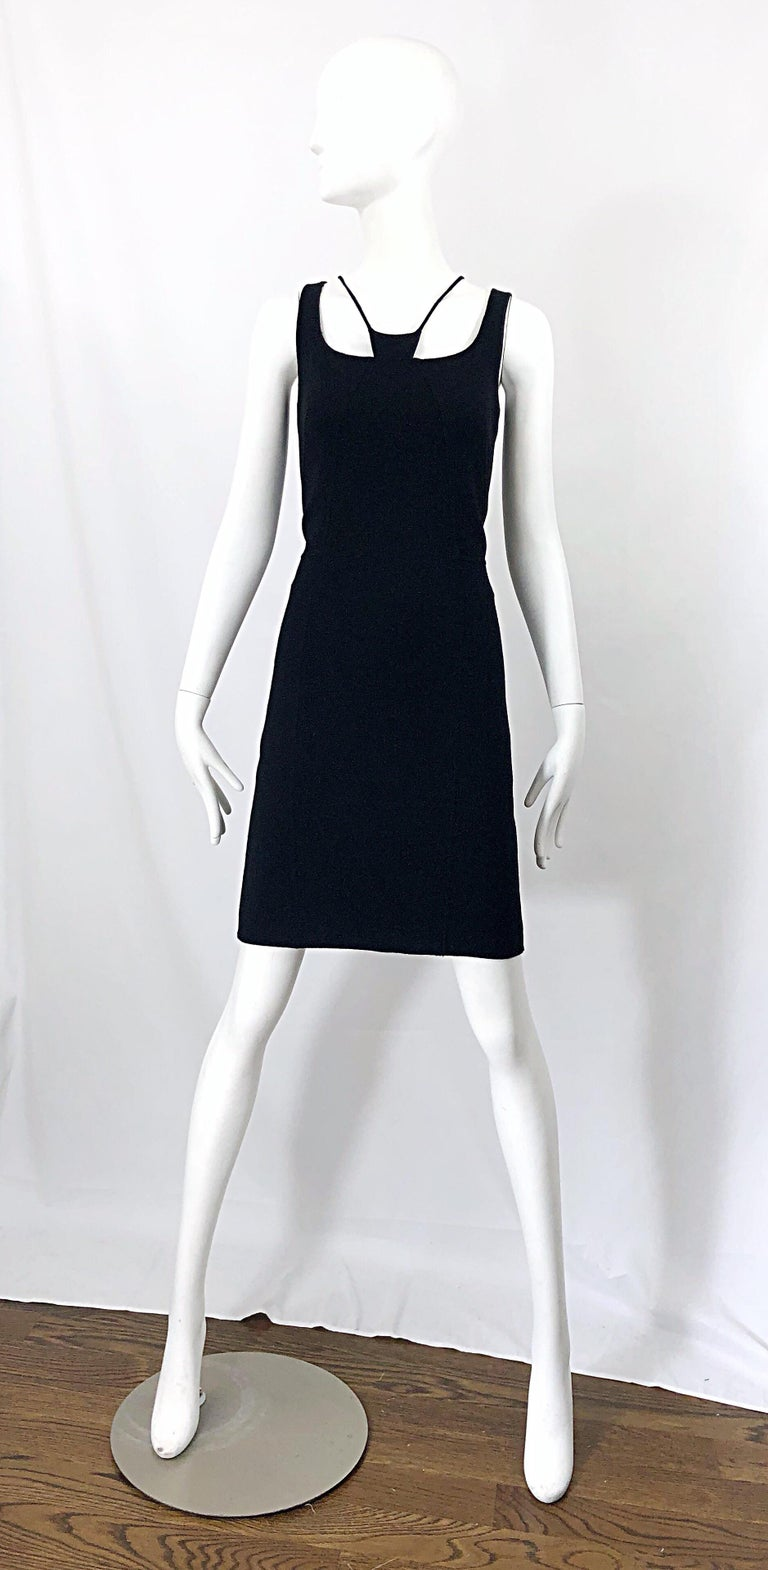 1990s Chado Ralph Rucci Rare Black Wool ' Bondage ' Vintage 90s Dress Size 4  For Sale 11